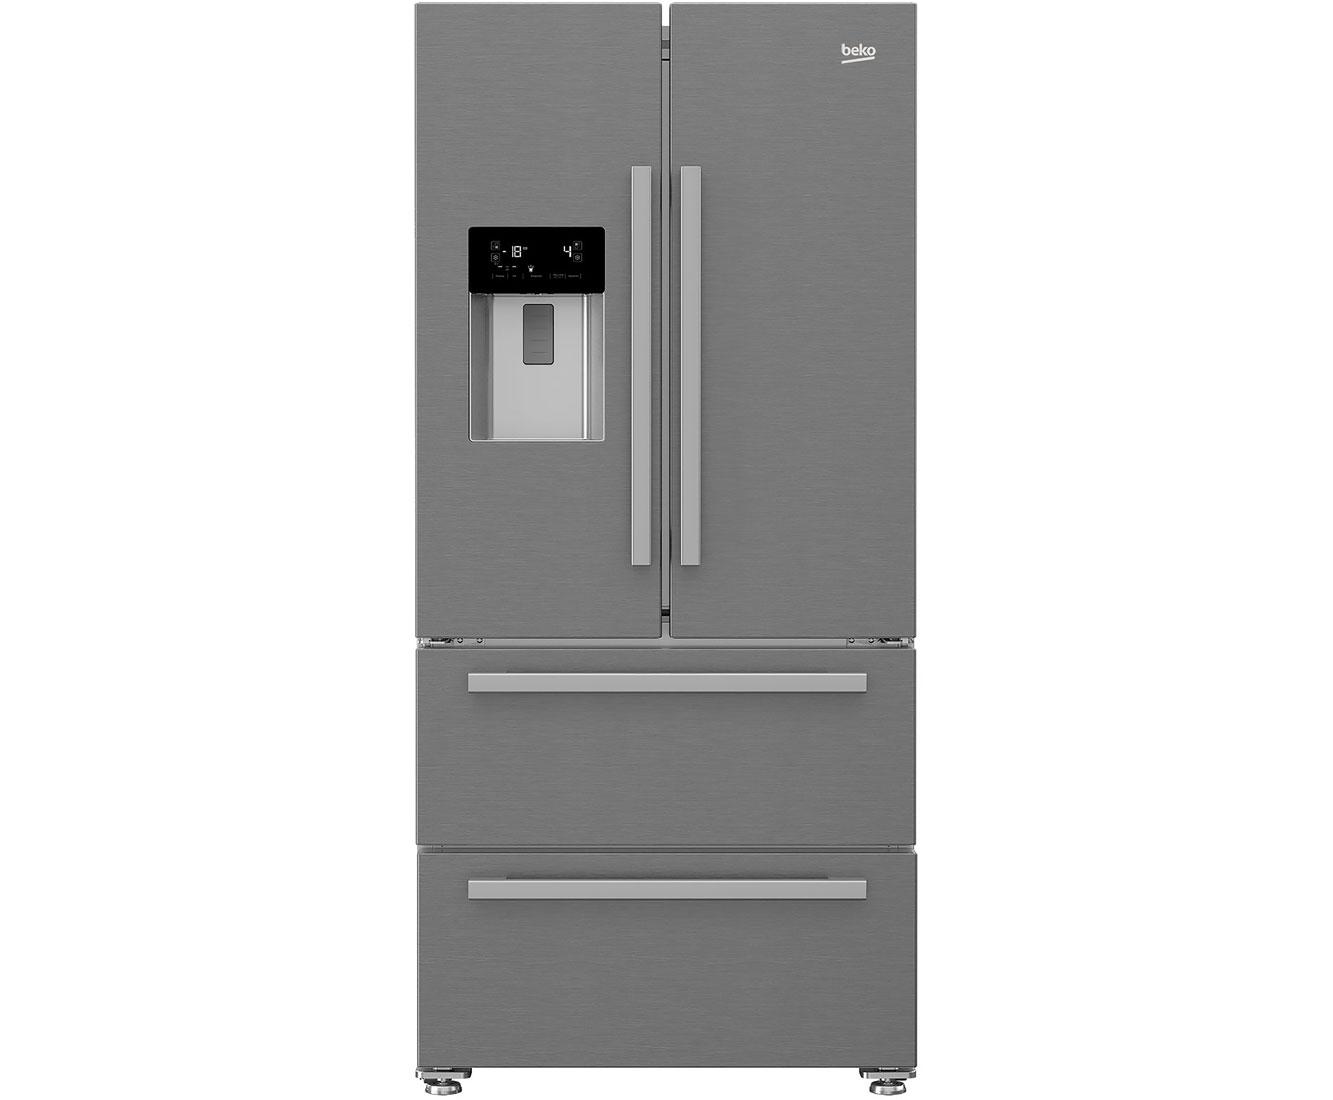 Bomann Kühlschrank Herkunft : Amica kühlschrank firma: kühl gefrierkombination amica kgc w